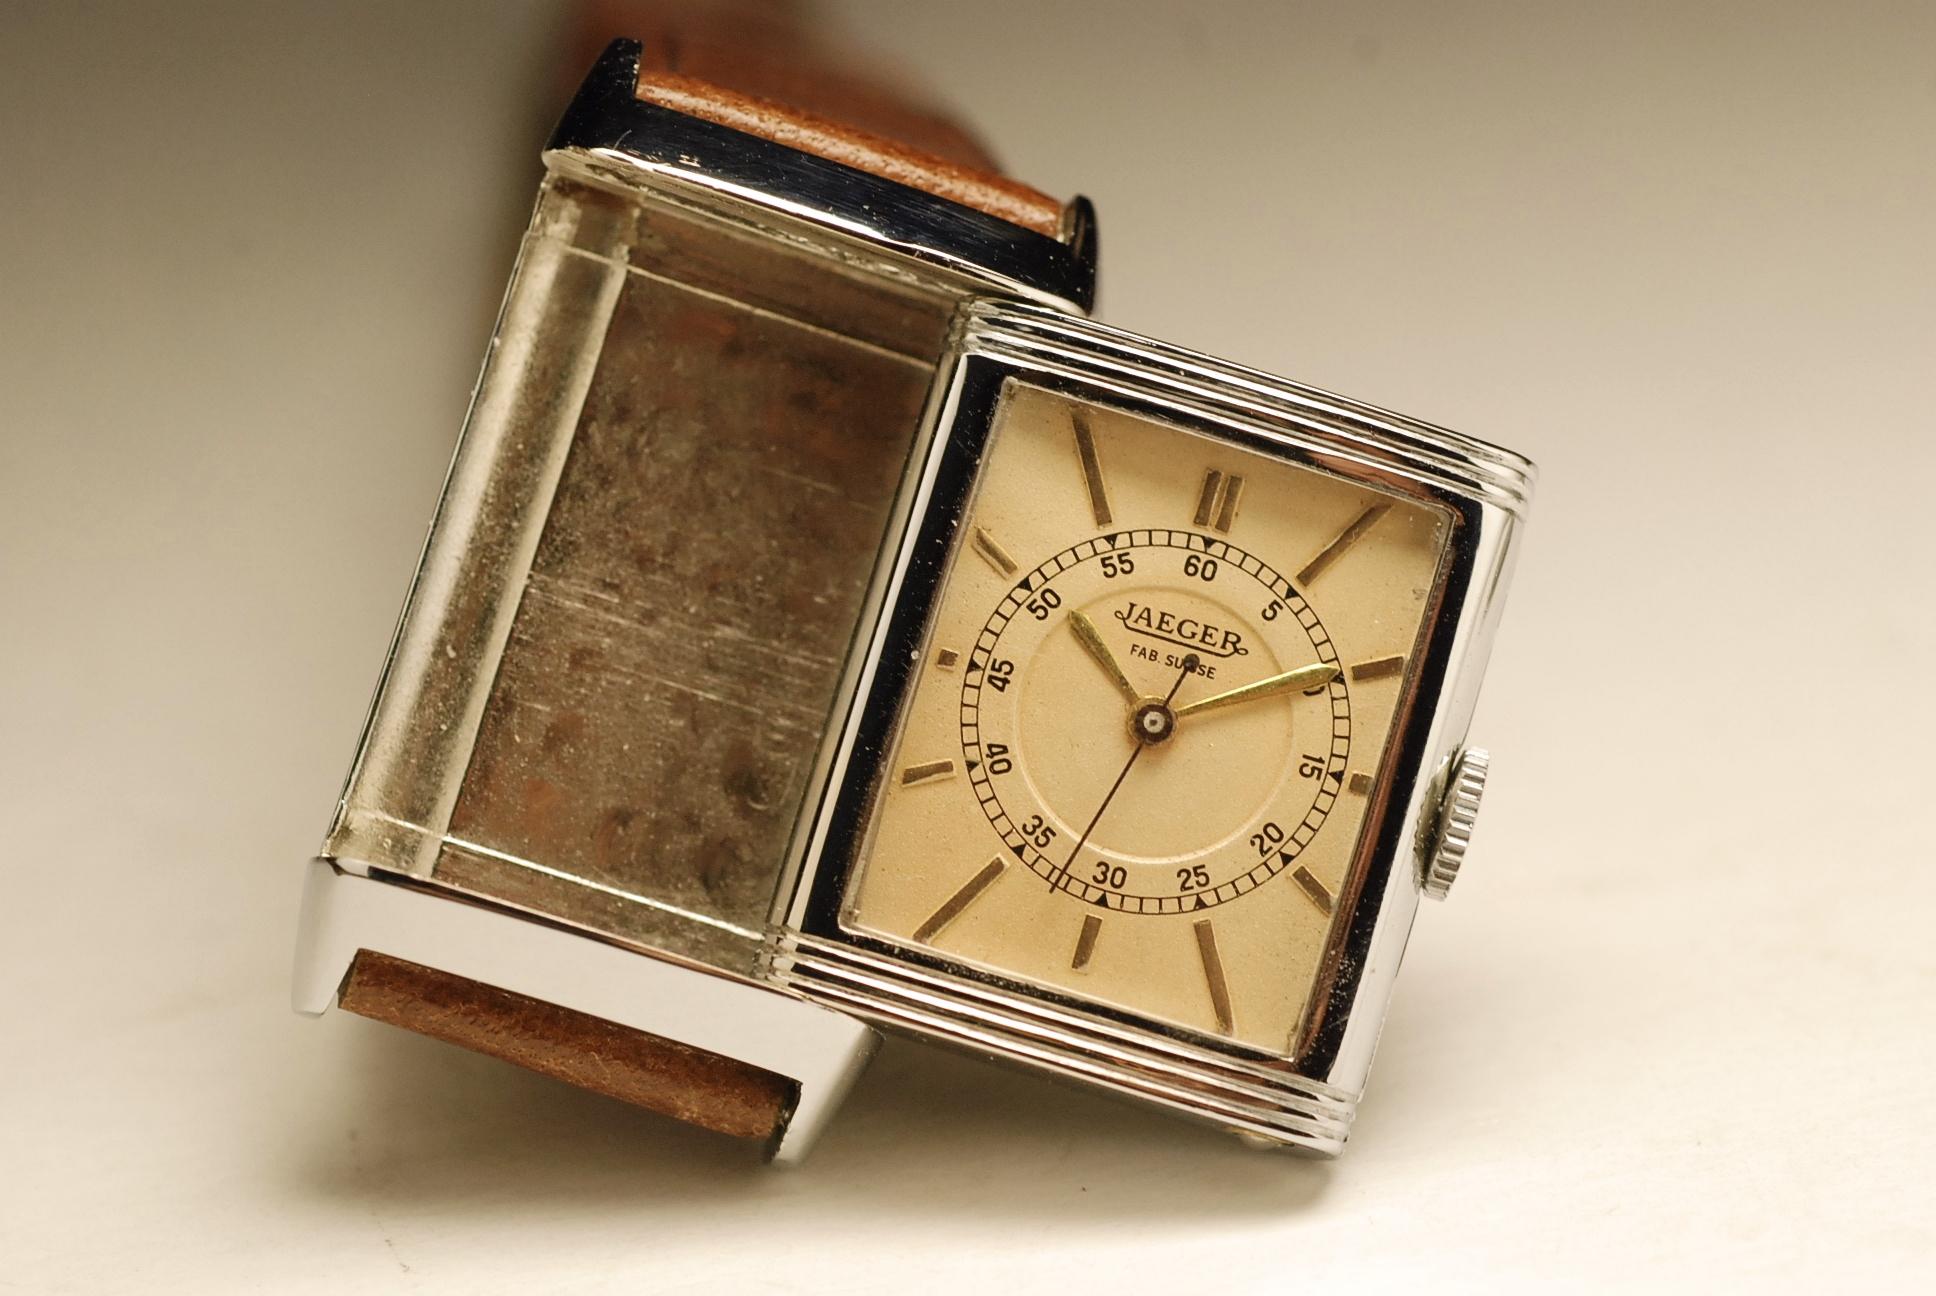 vintage jaeger lecoultre reverso uniplan watch montre. Black Bedroom Furniture Sets. Home Design Ideas